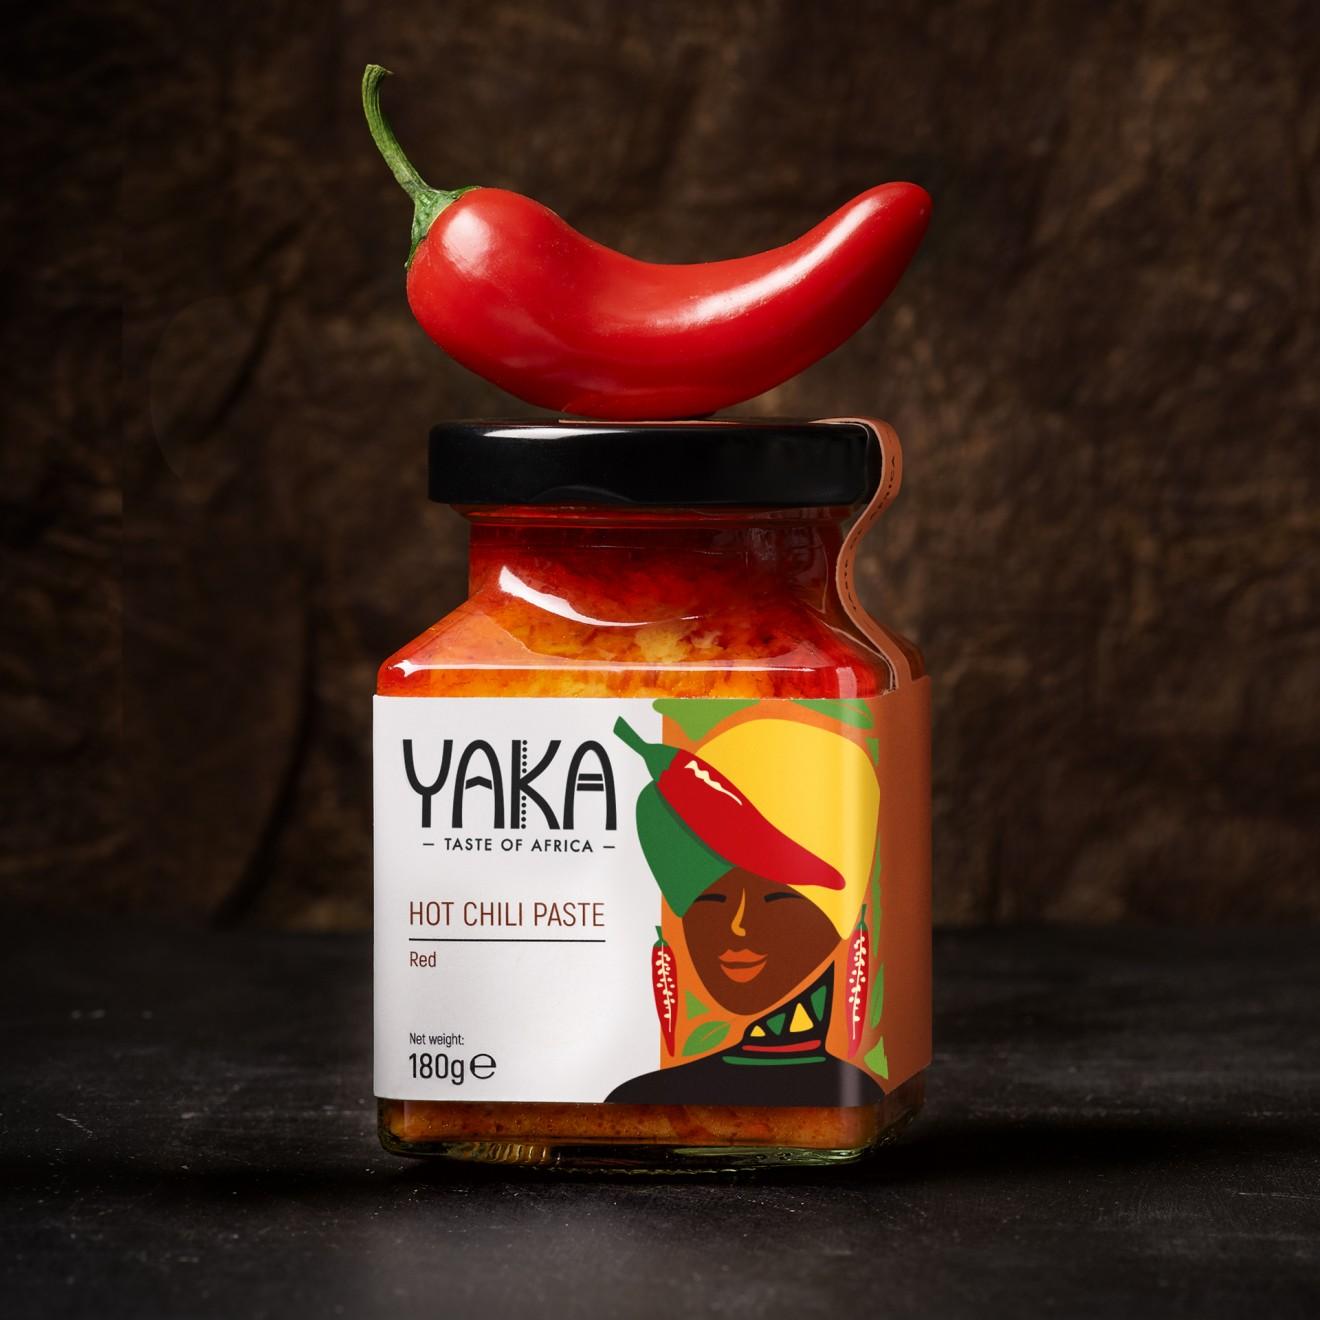 Quatre Mains package design - chili, red, paste, lady